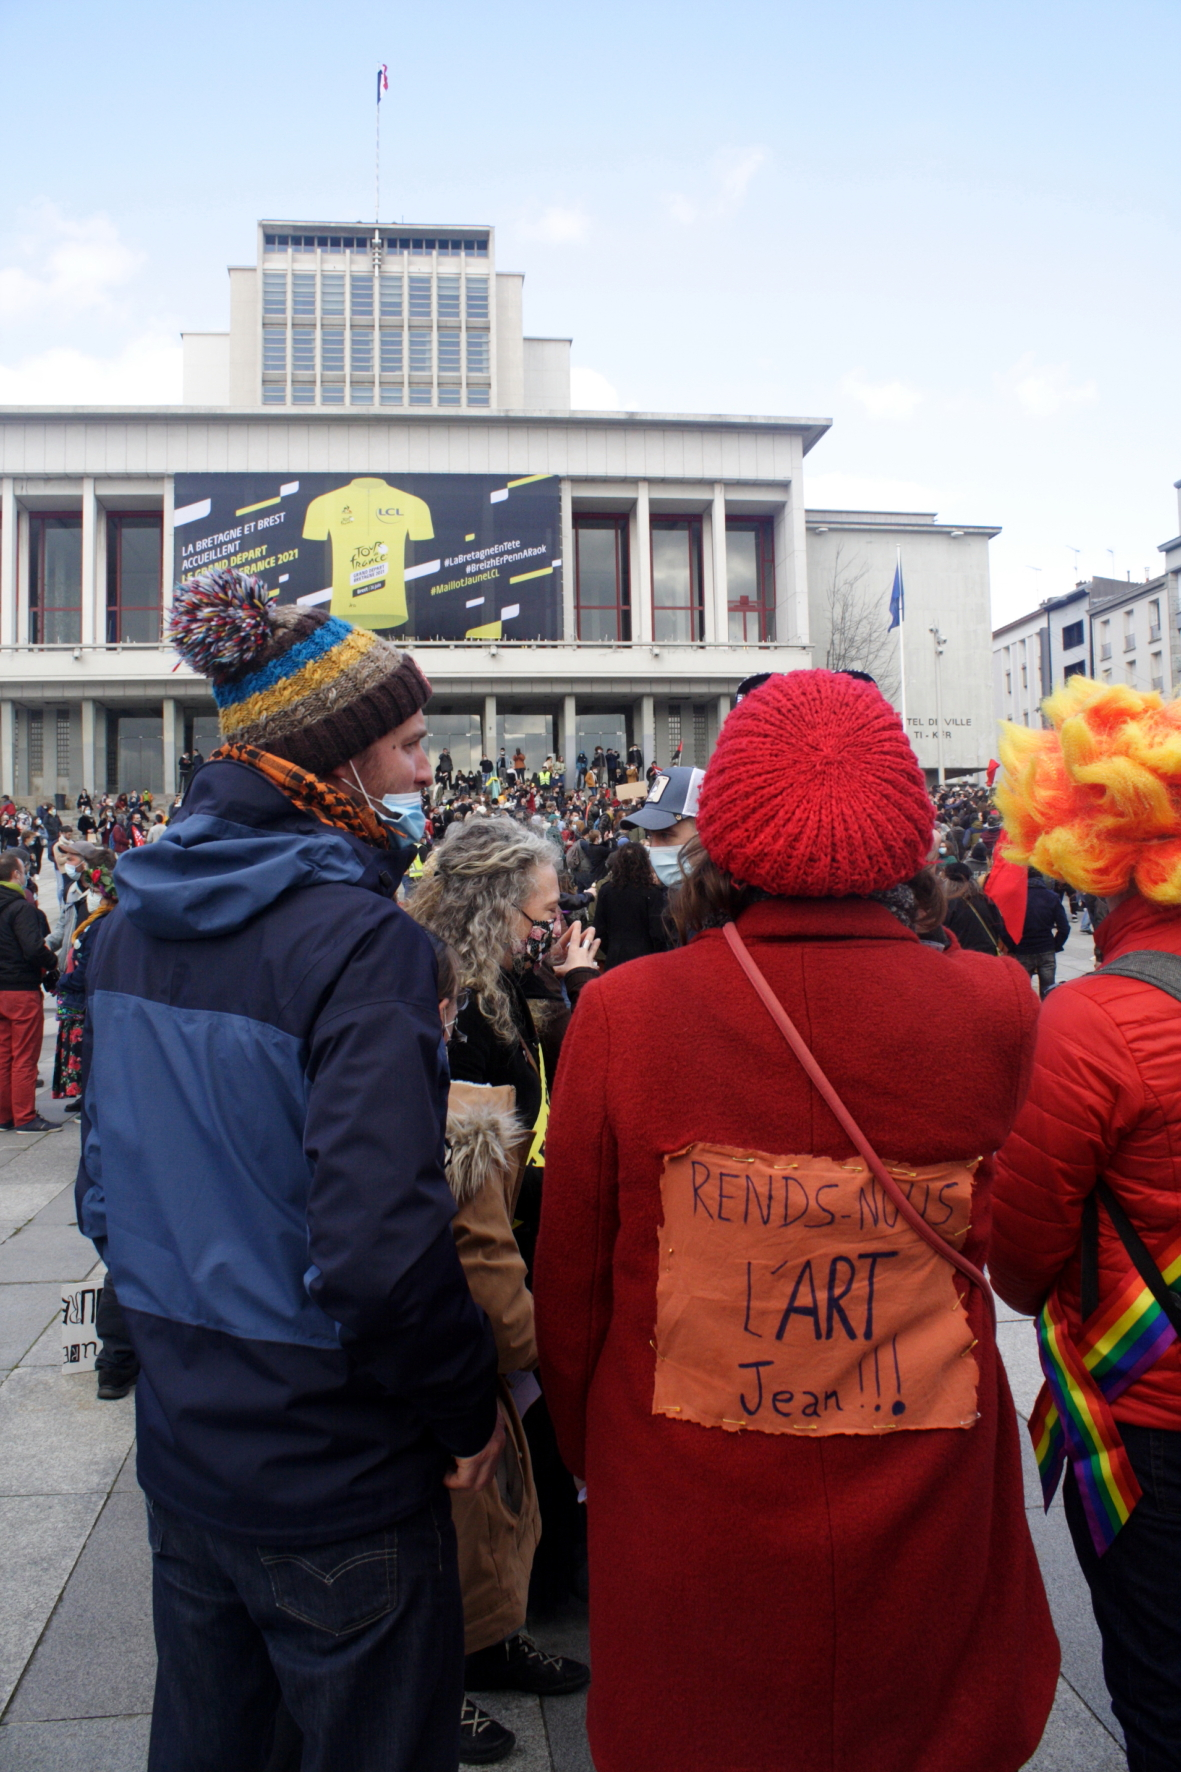 Manif-culture-Brest-20-03-21-218